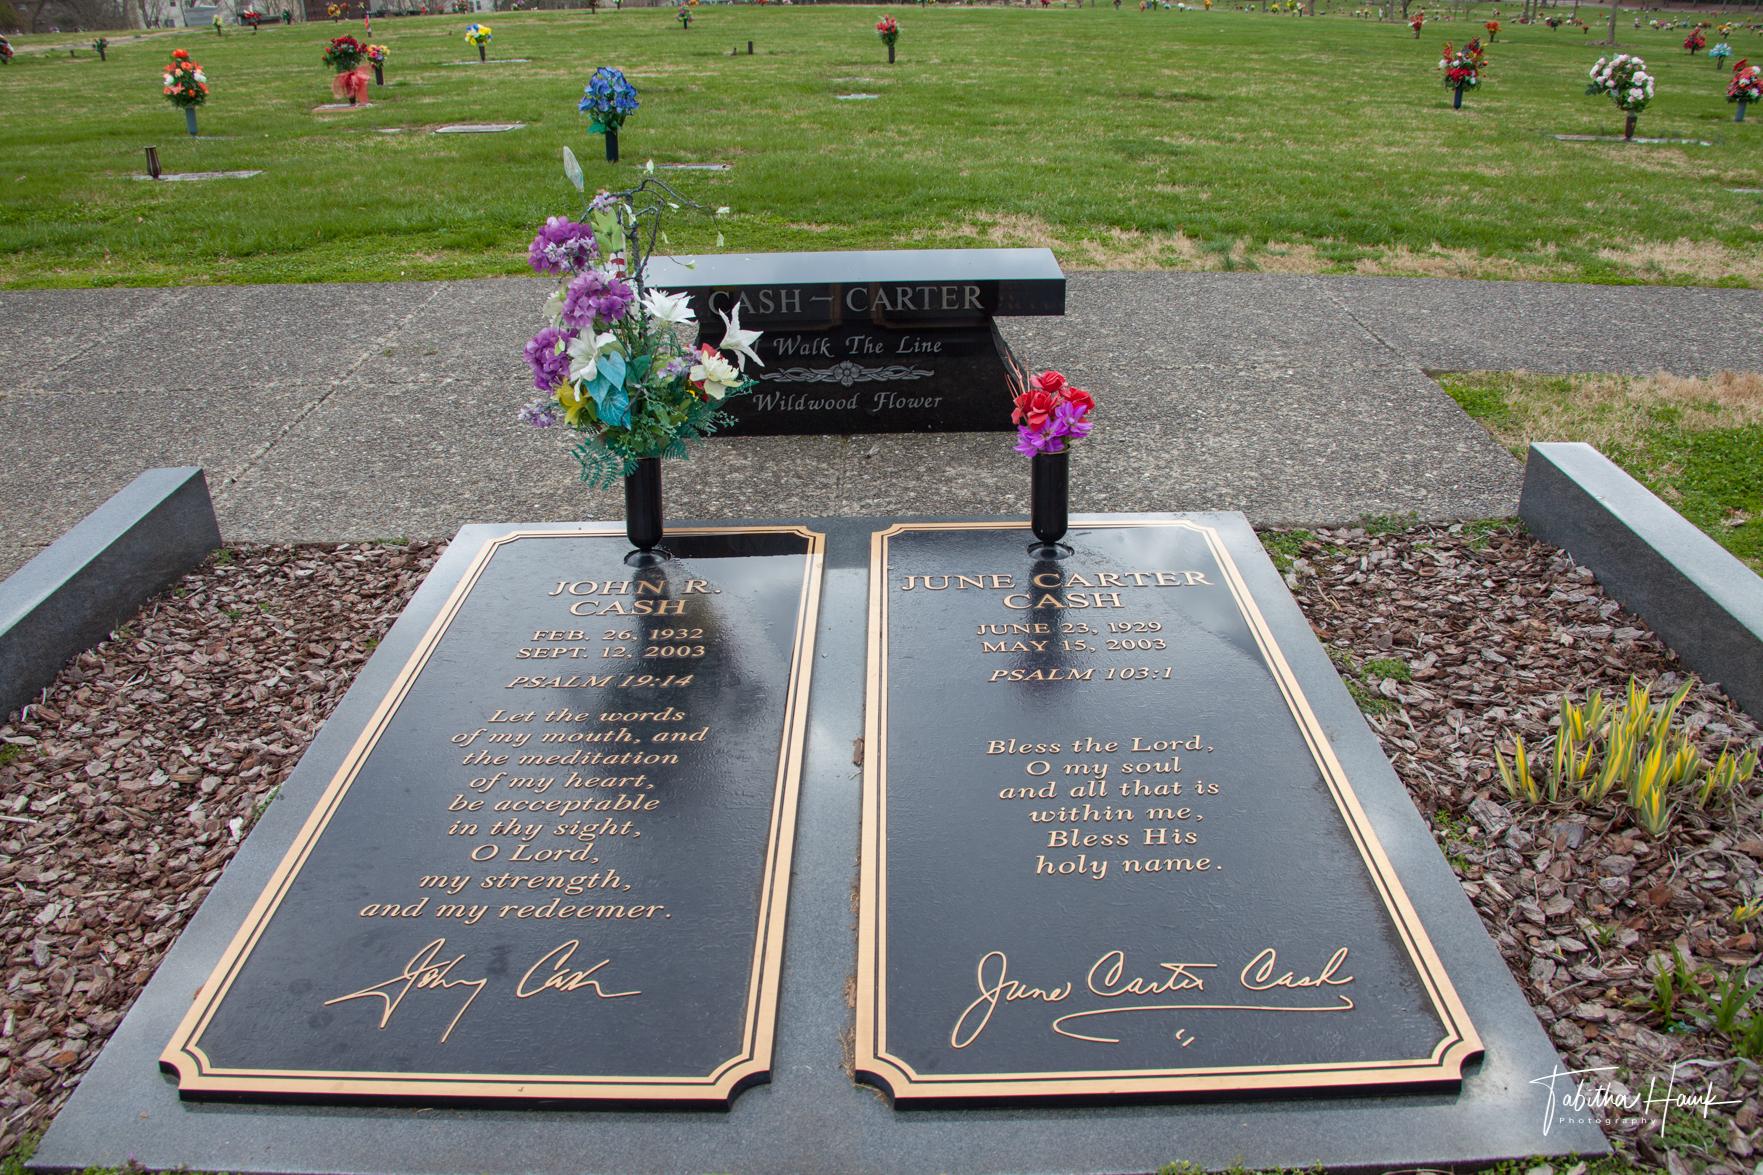 Famous Gravesites of Ohio & Tennessee | Nashville Travel